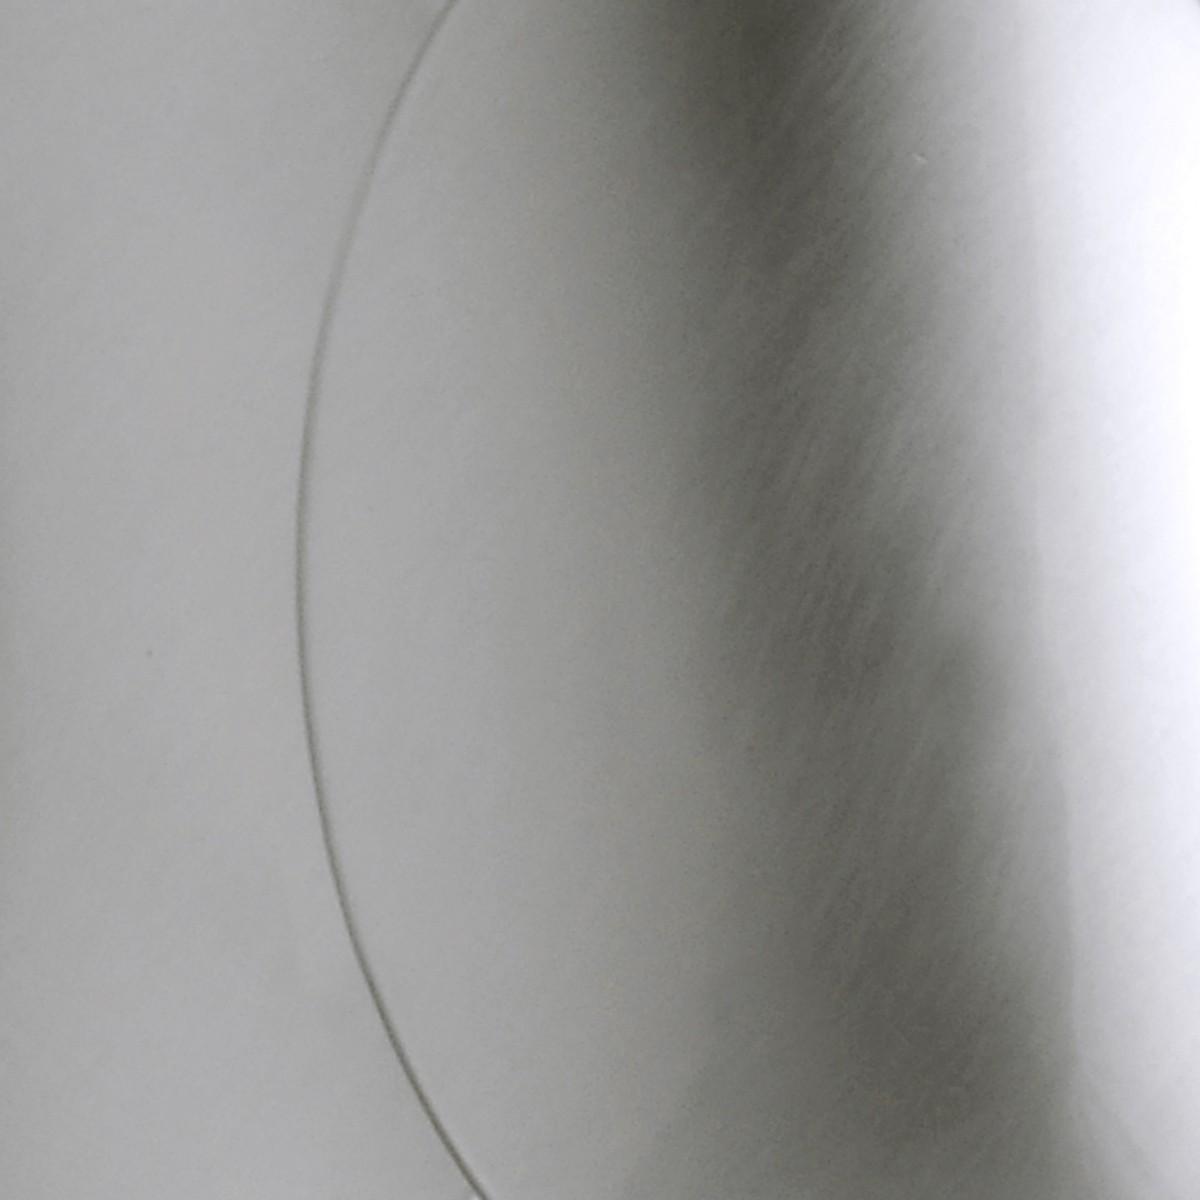 Milan Obolo Pendelleuchte, oval, Nickeloptik gebürstet